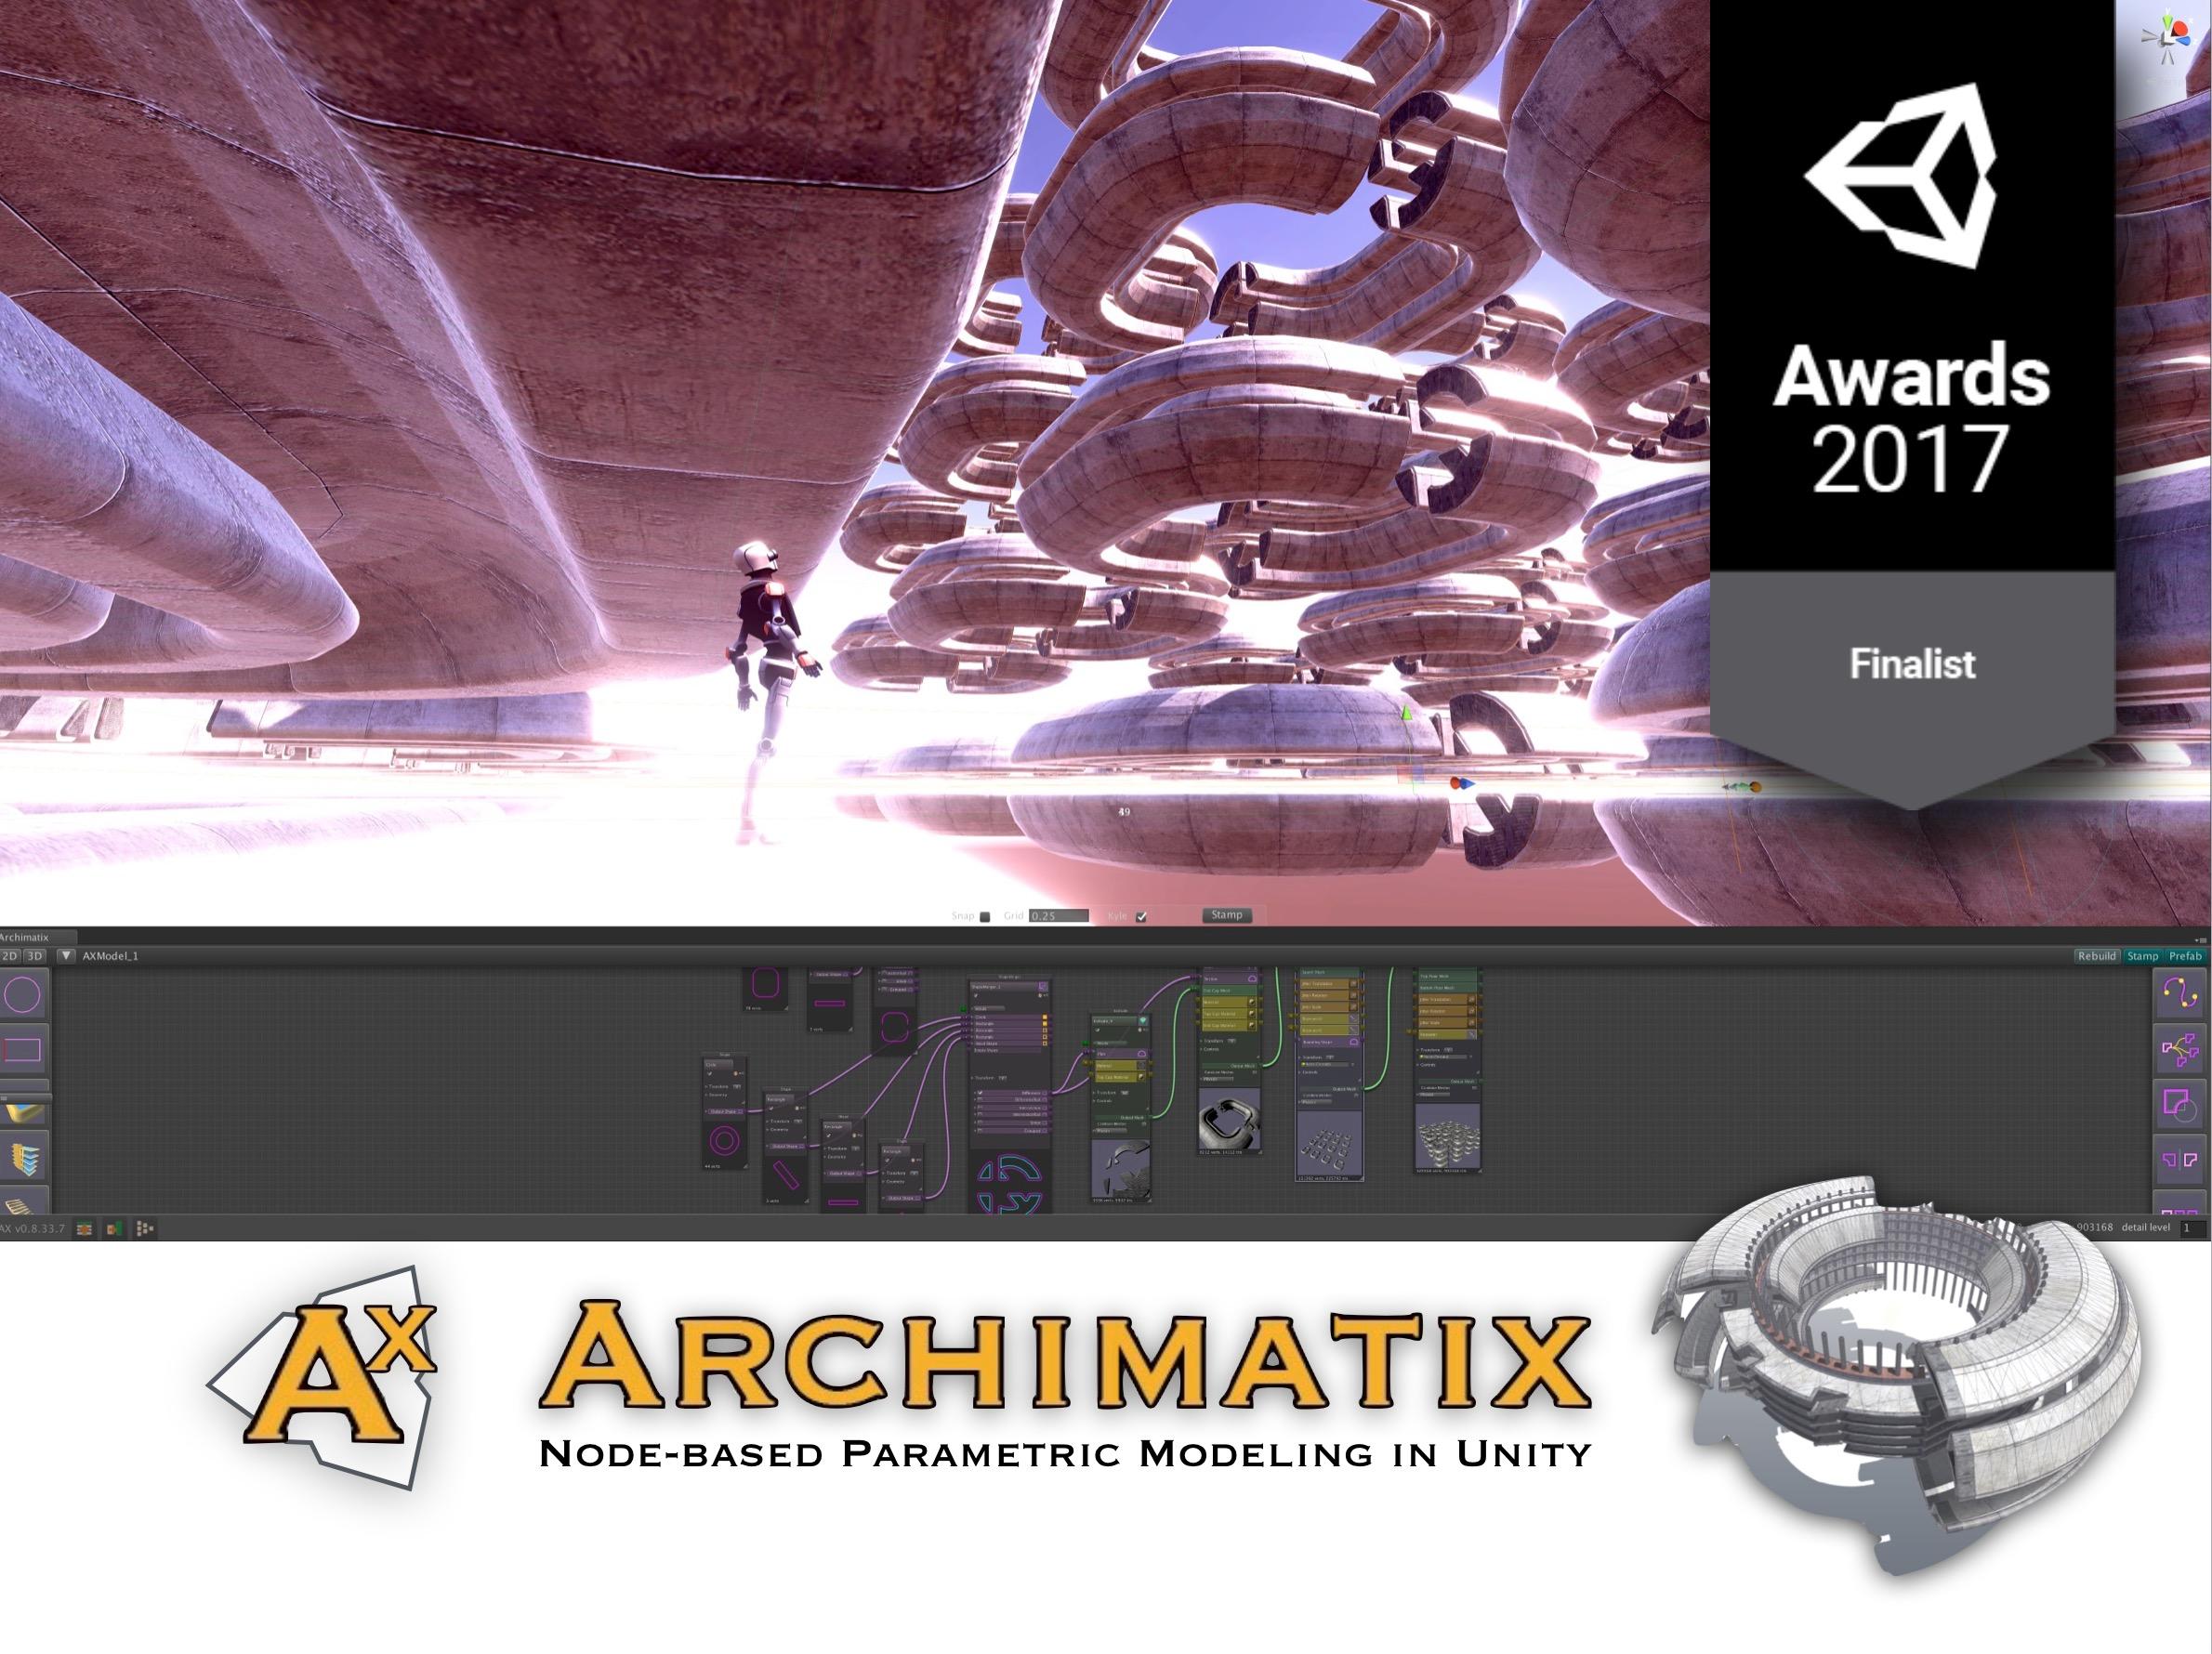 Archimatix 2017-09-13_12-48-08_PM.jpg